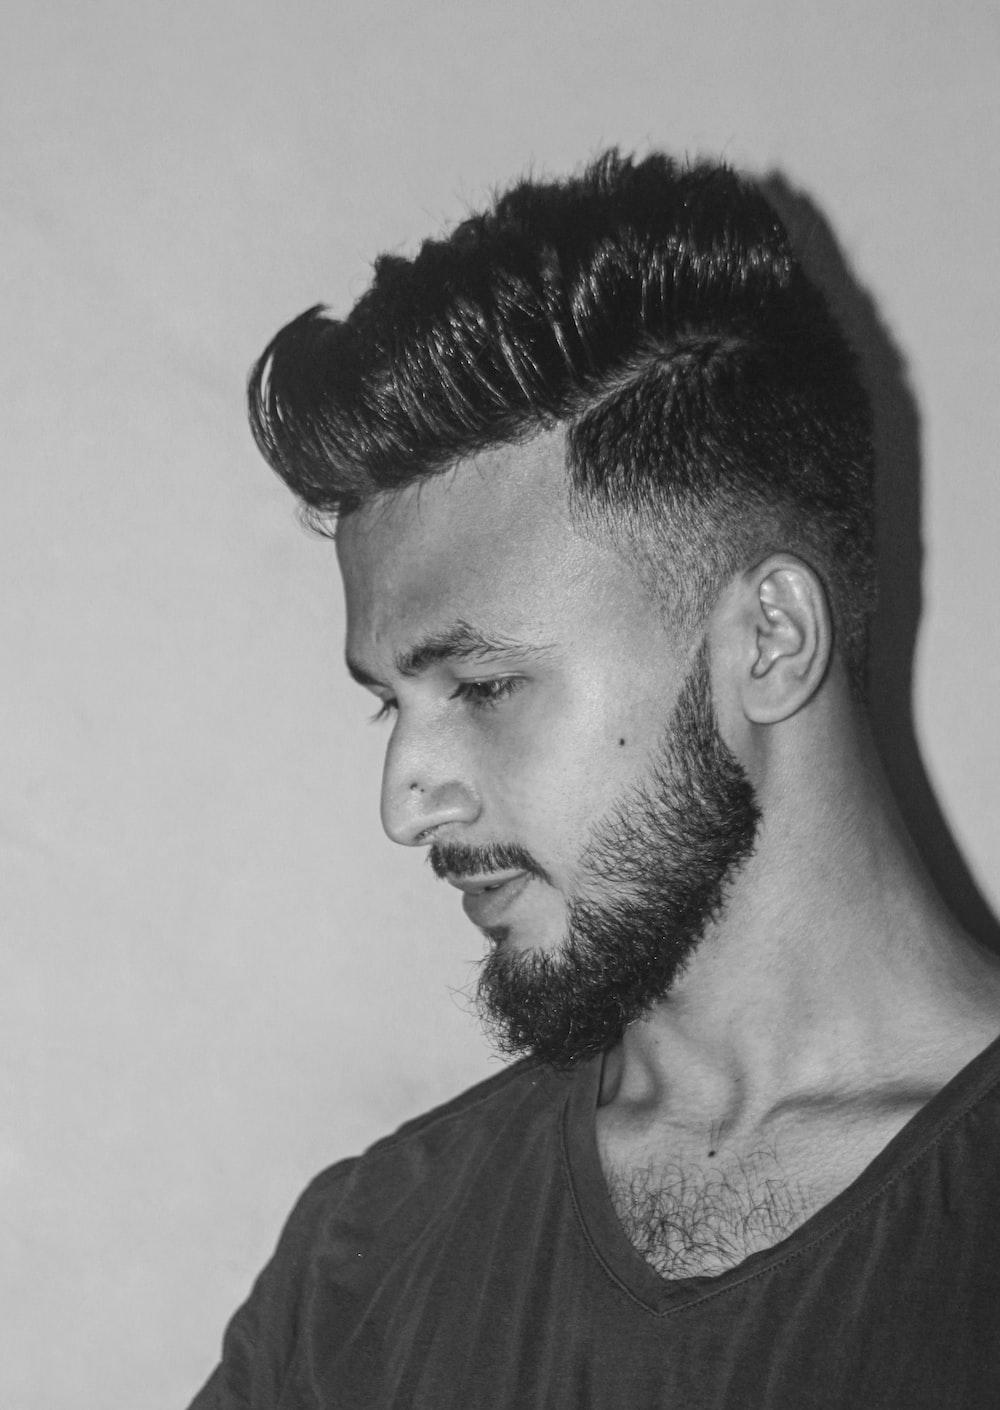 mens haircut with fade and beard